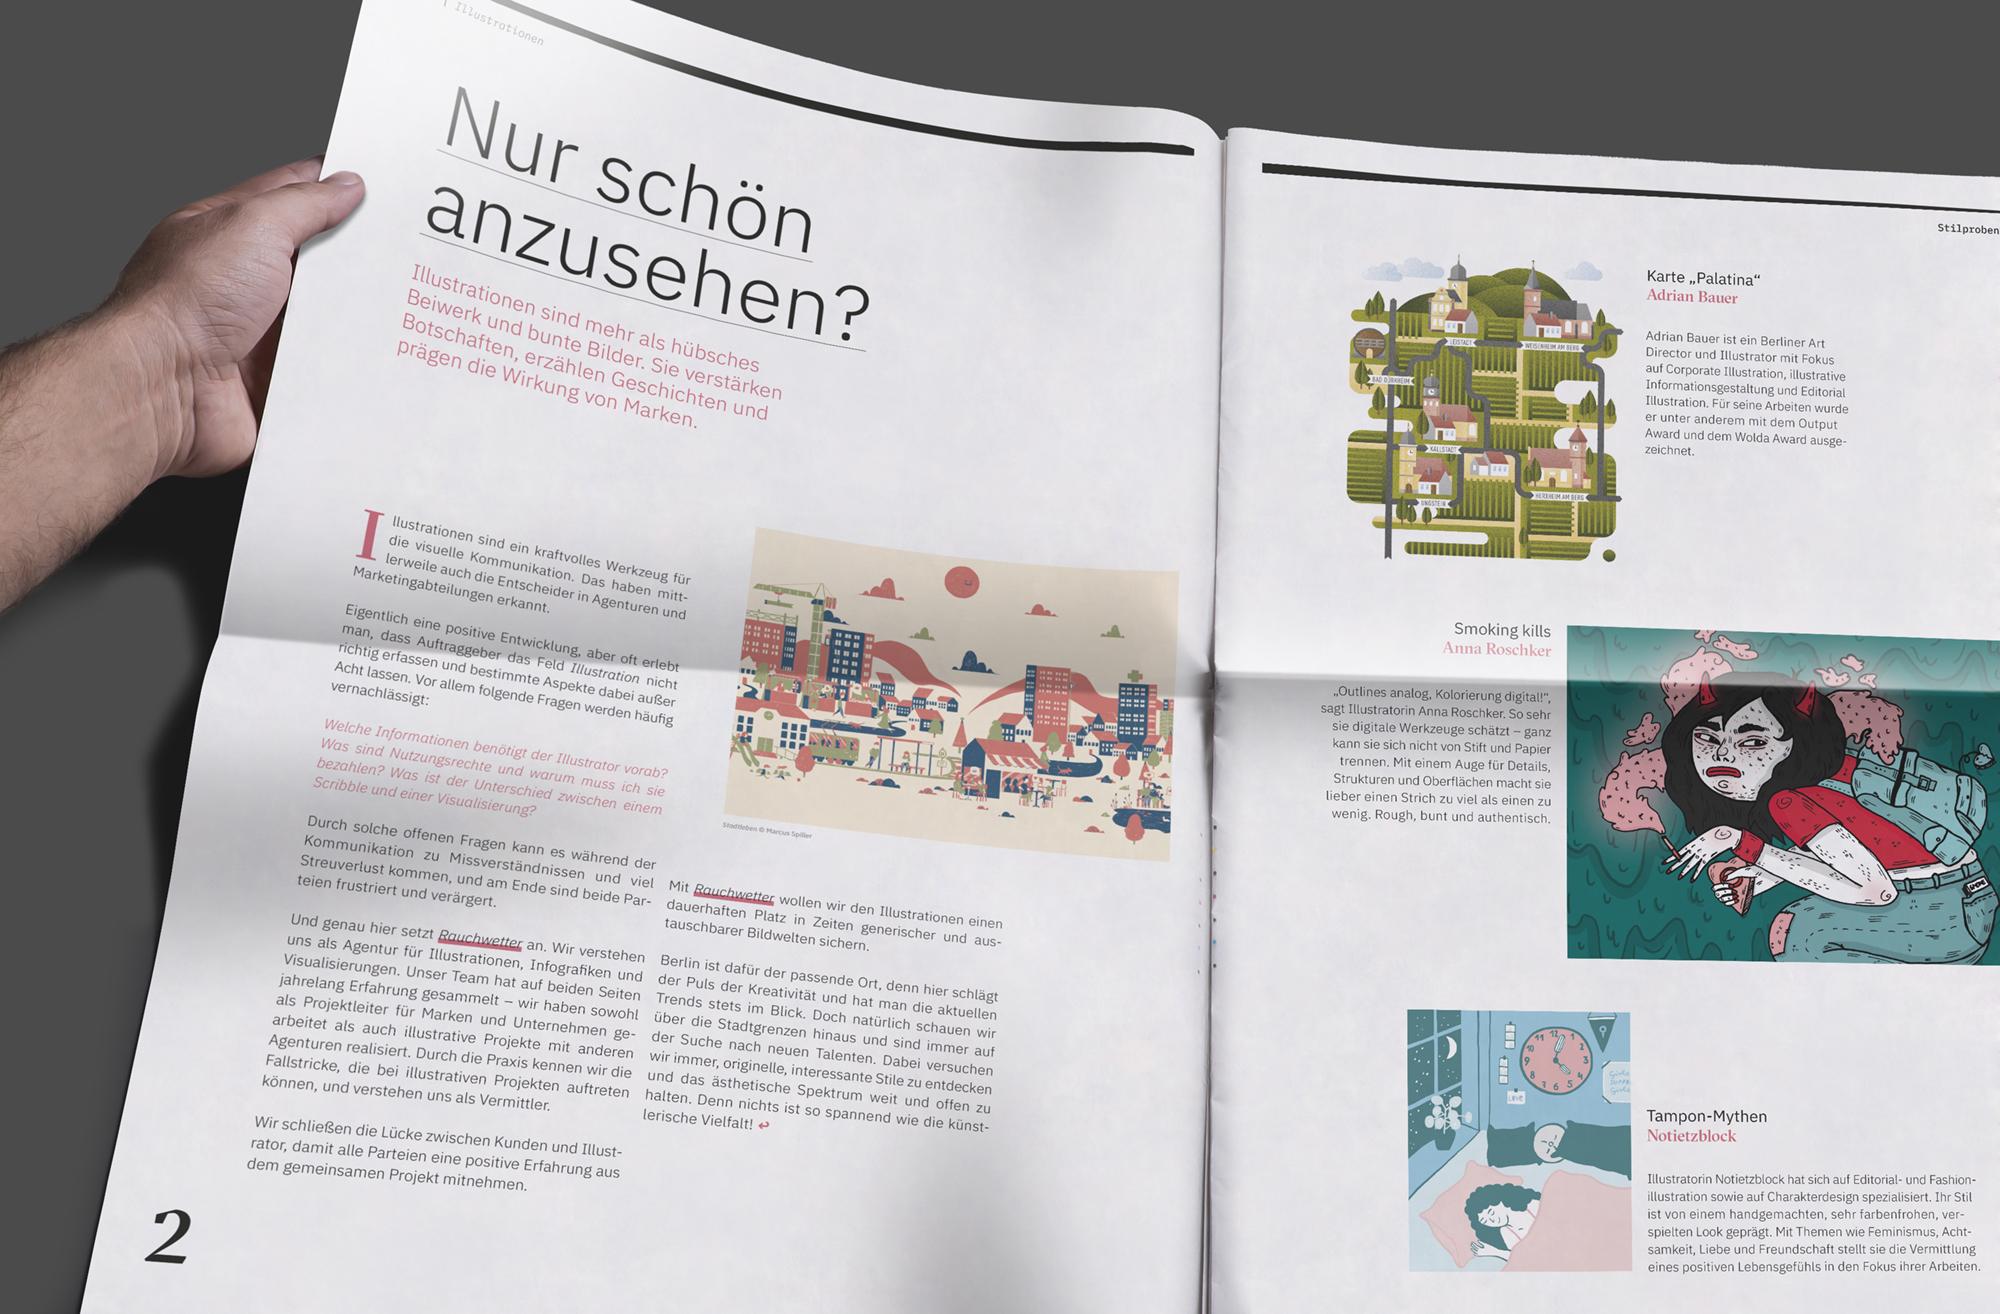 Zeitung 04 (Rauchwetter, Corporate Design)